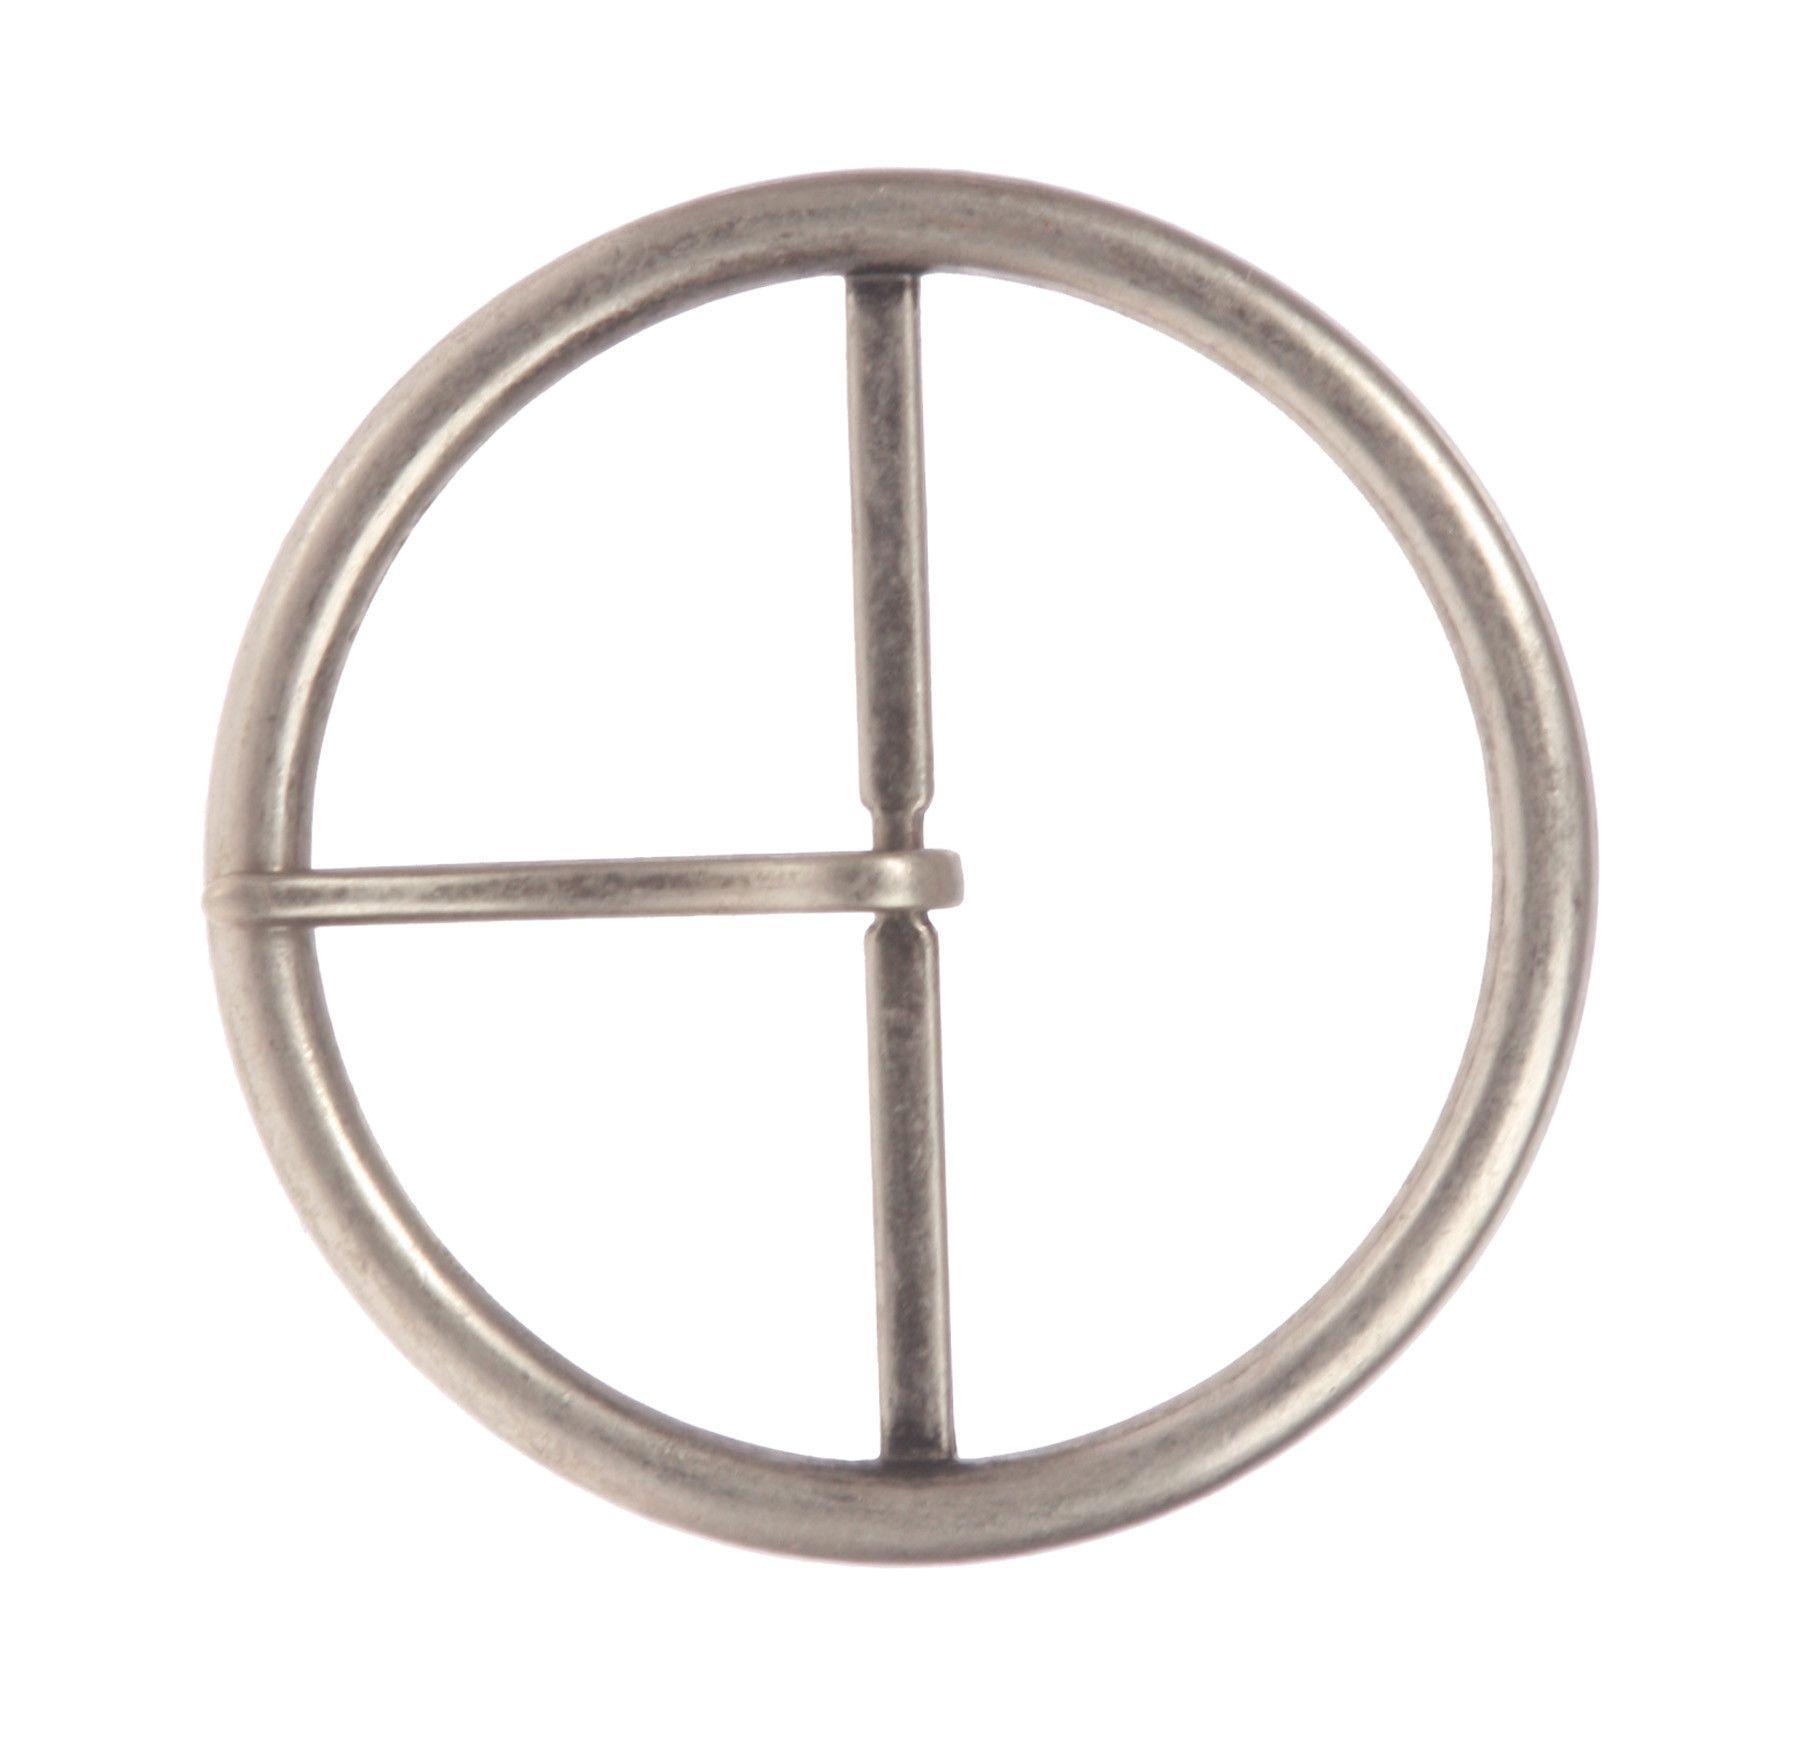 "2 5/8"" (68 mm) Single Prong Round Circle Center Bar Belt Buckle"